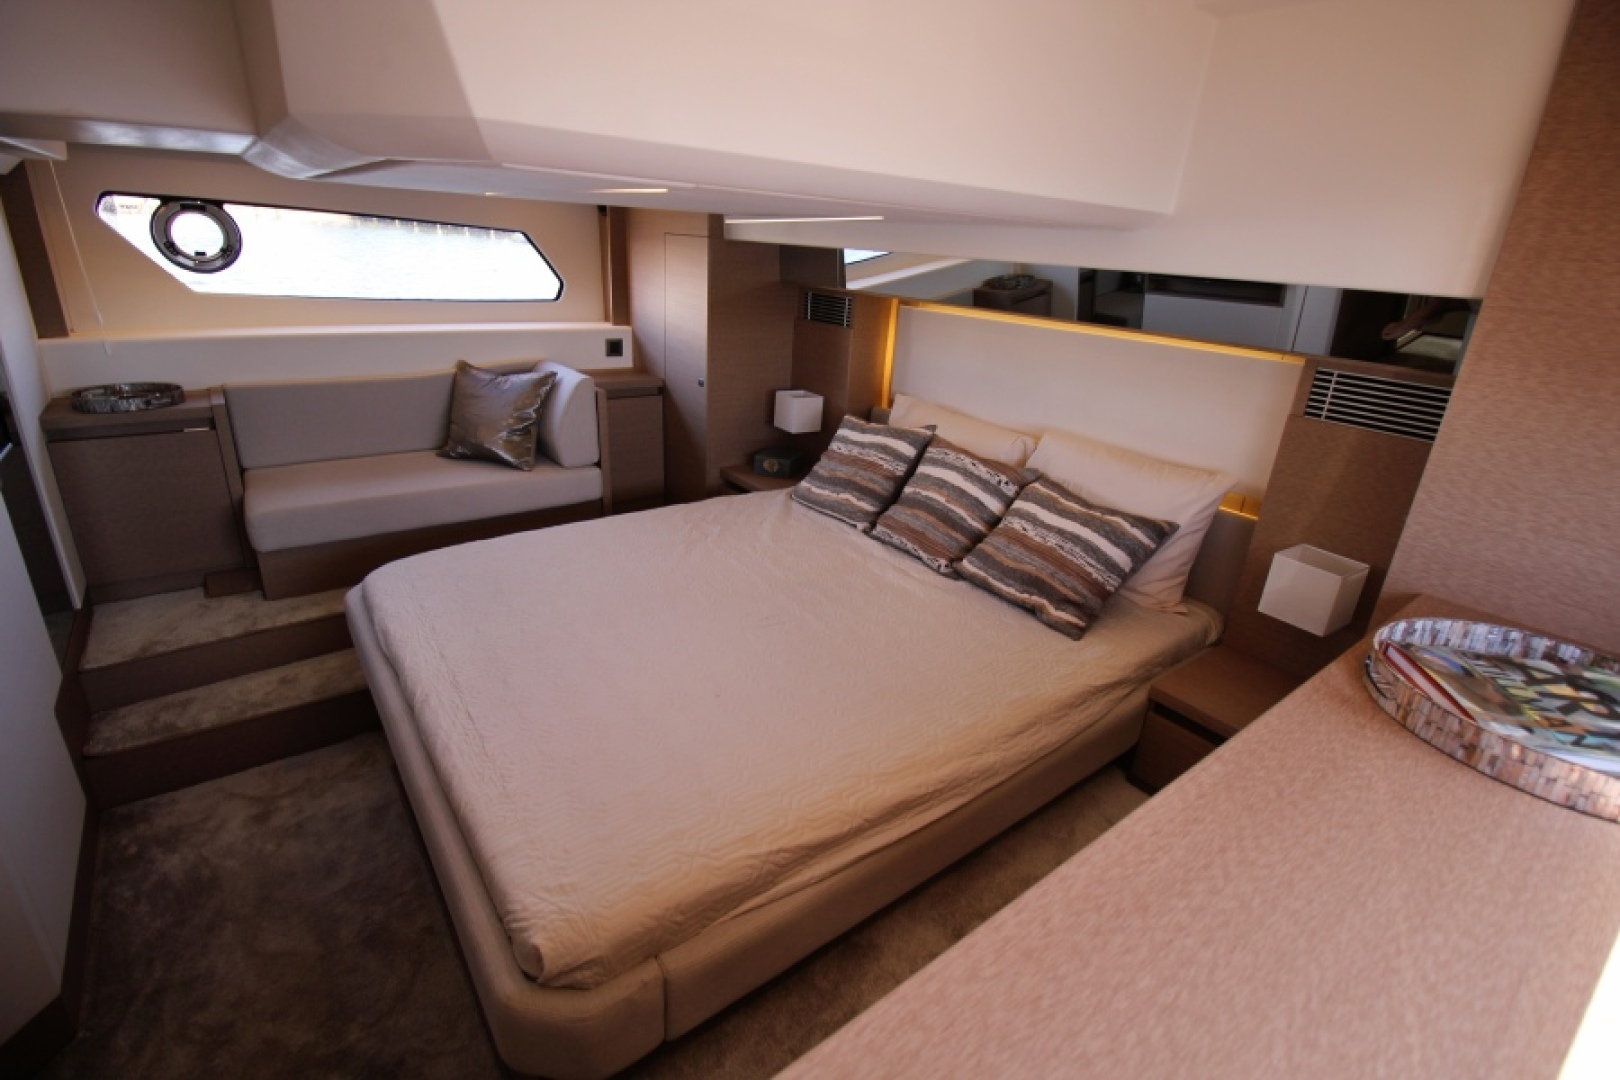 Prestige-460 S 2018-Unforgettable St Petersburg-Florida-United States-2018 Prestige 460 S Yacht  Unforgettable -Master Stateroom-1444271   Thumbnail